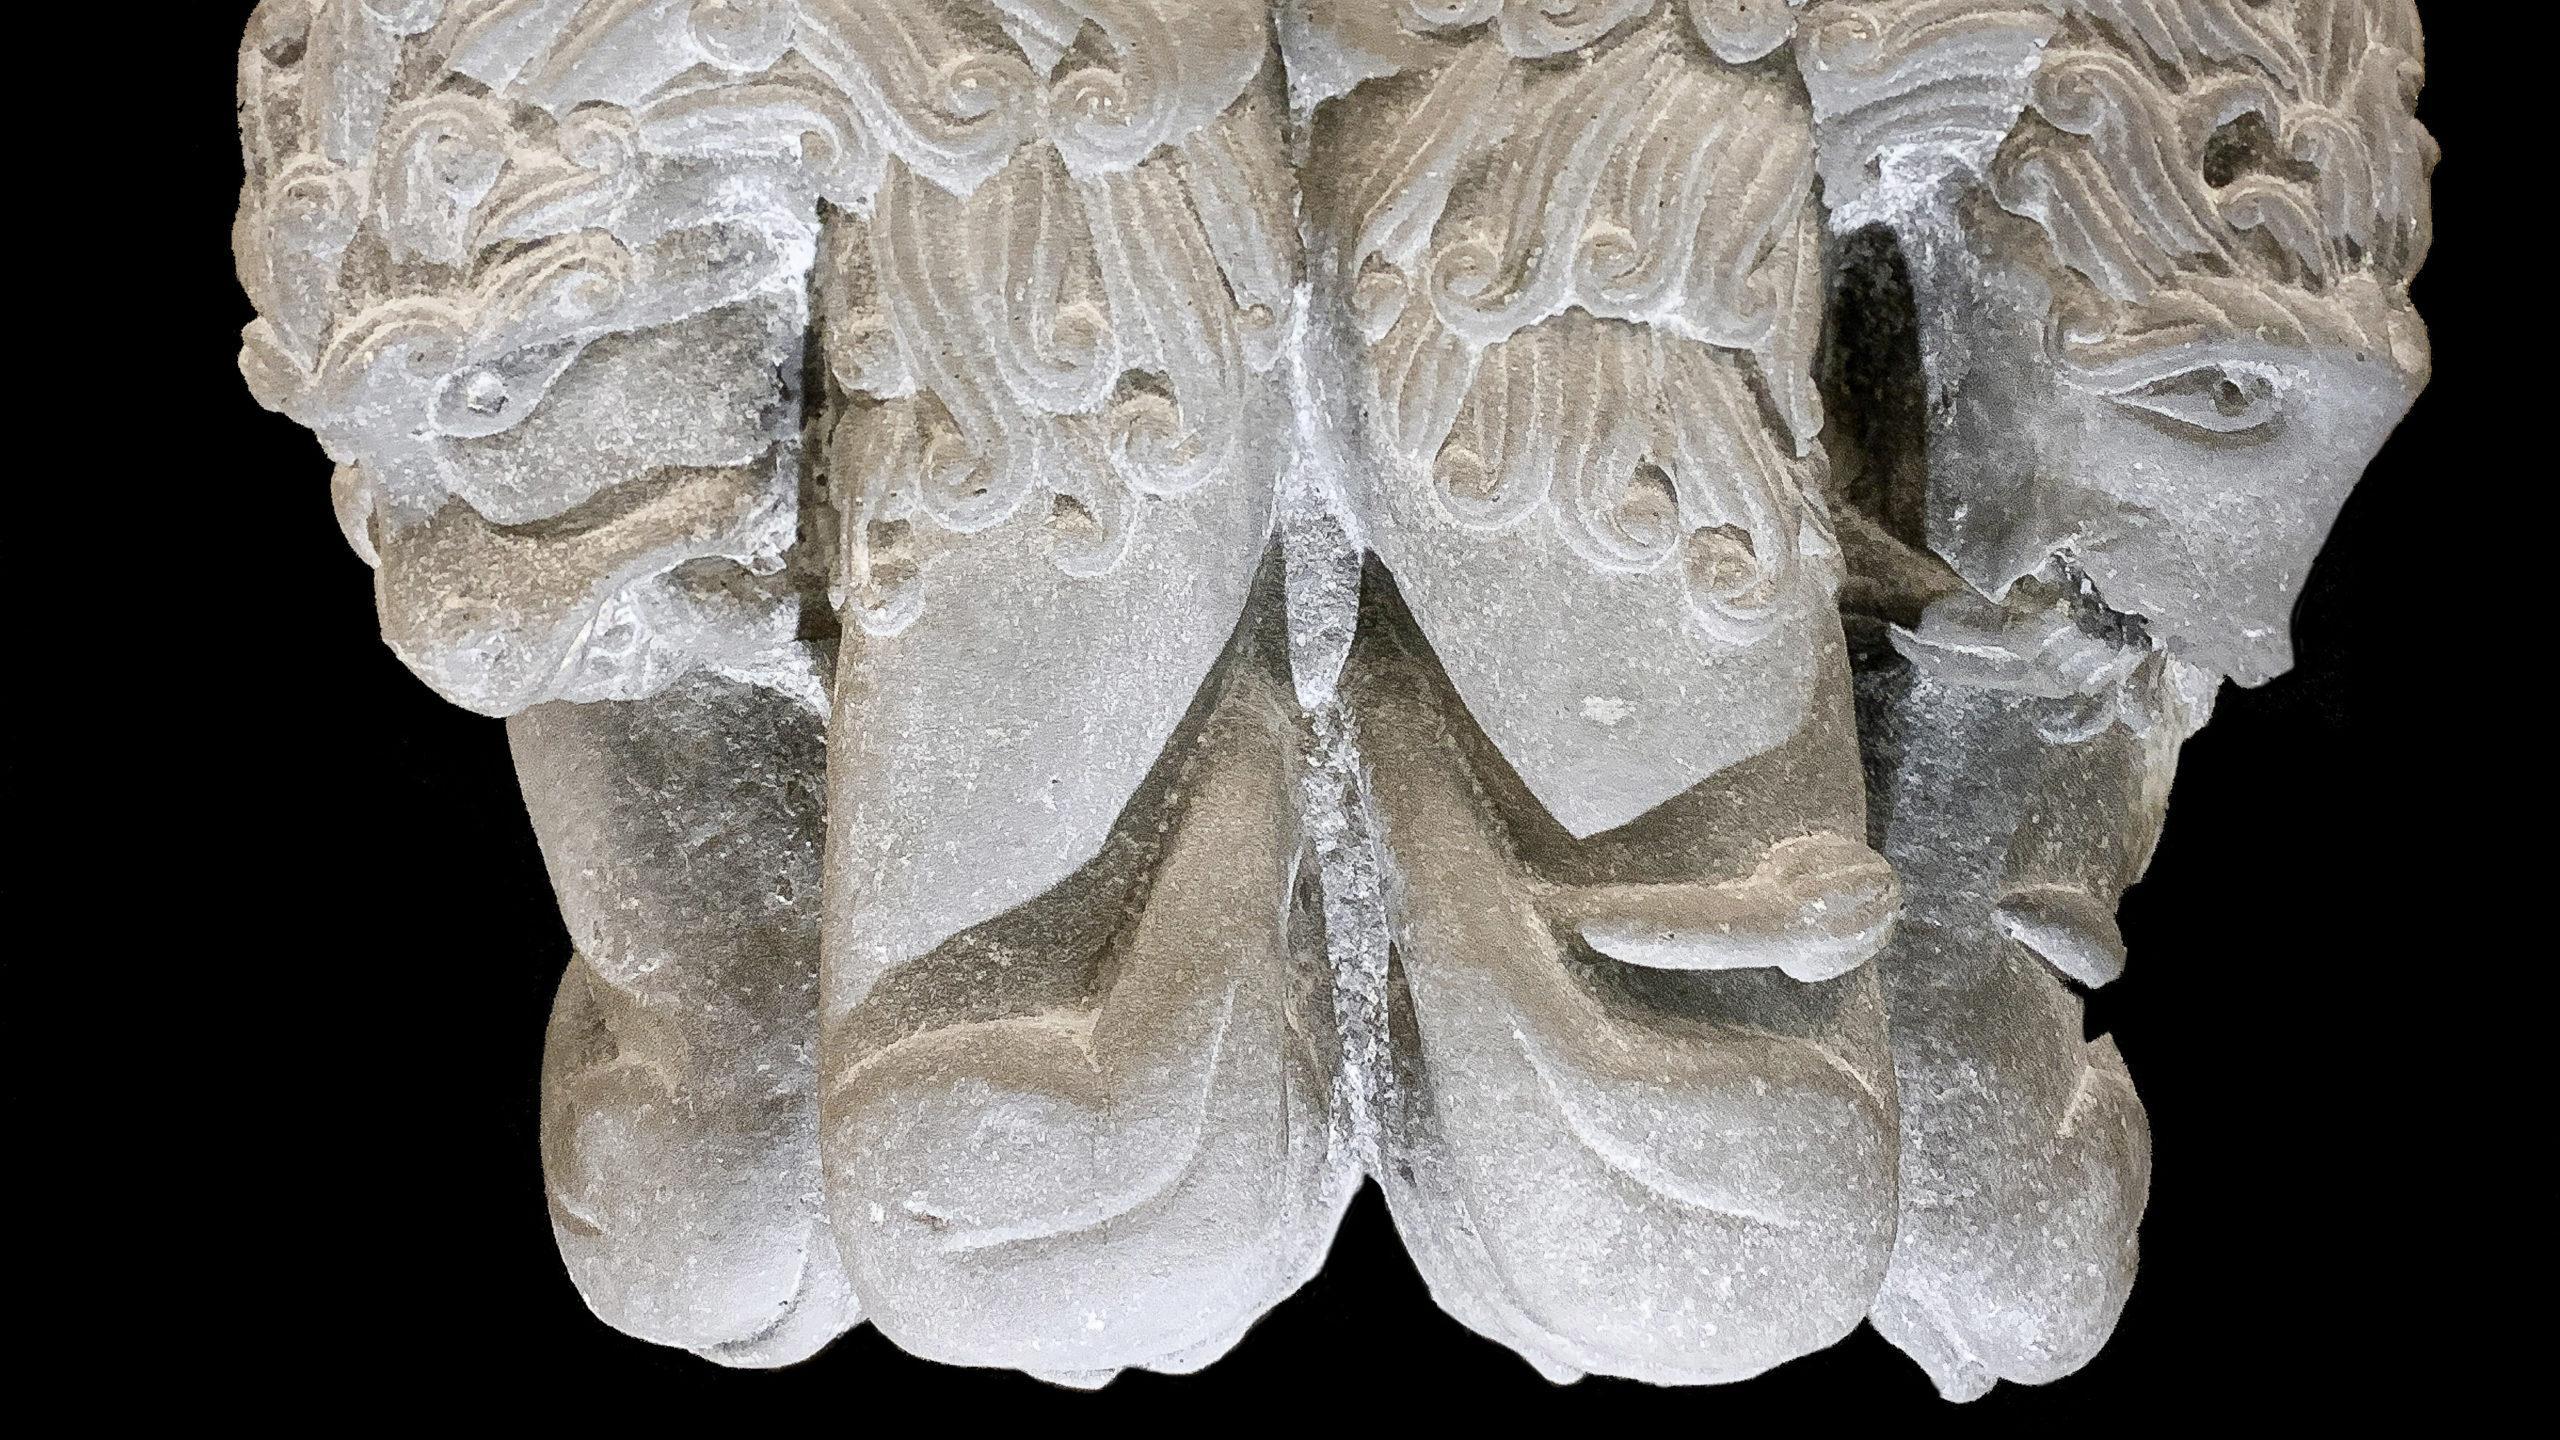 Le Maître de Cabestany: hat nahezu alle lokalen Gesteinarten bearbeitet. Foto: Hilke Maunder